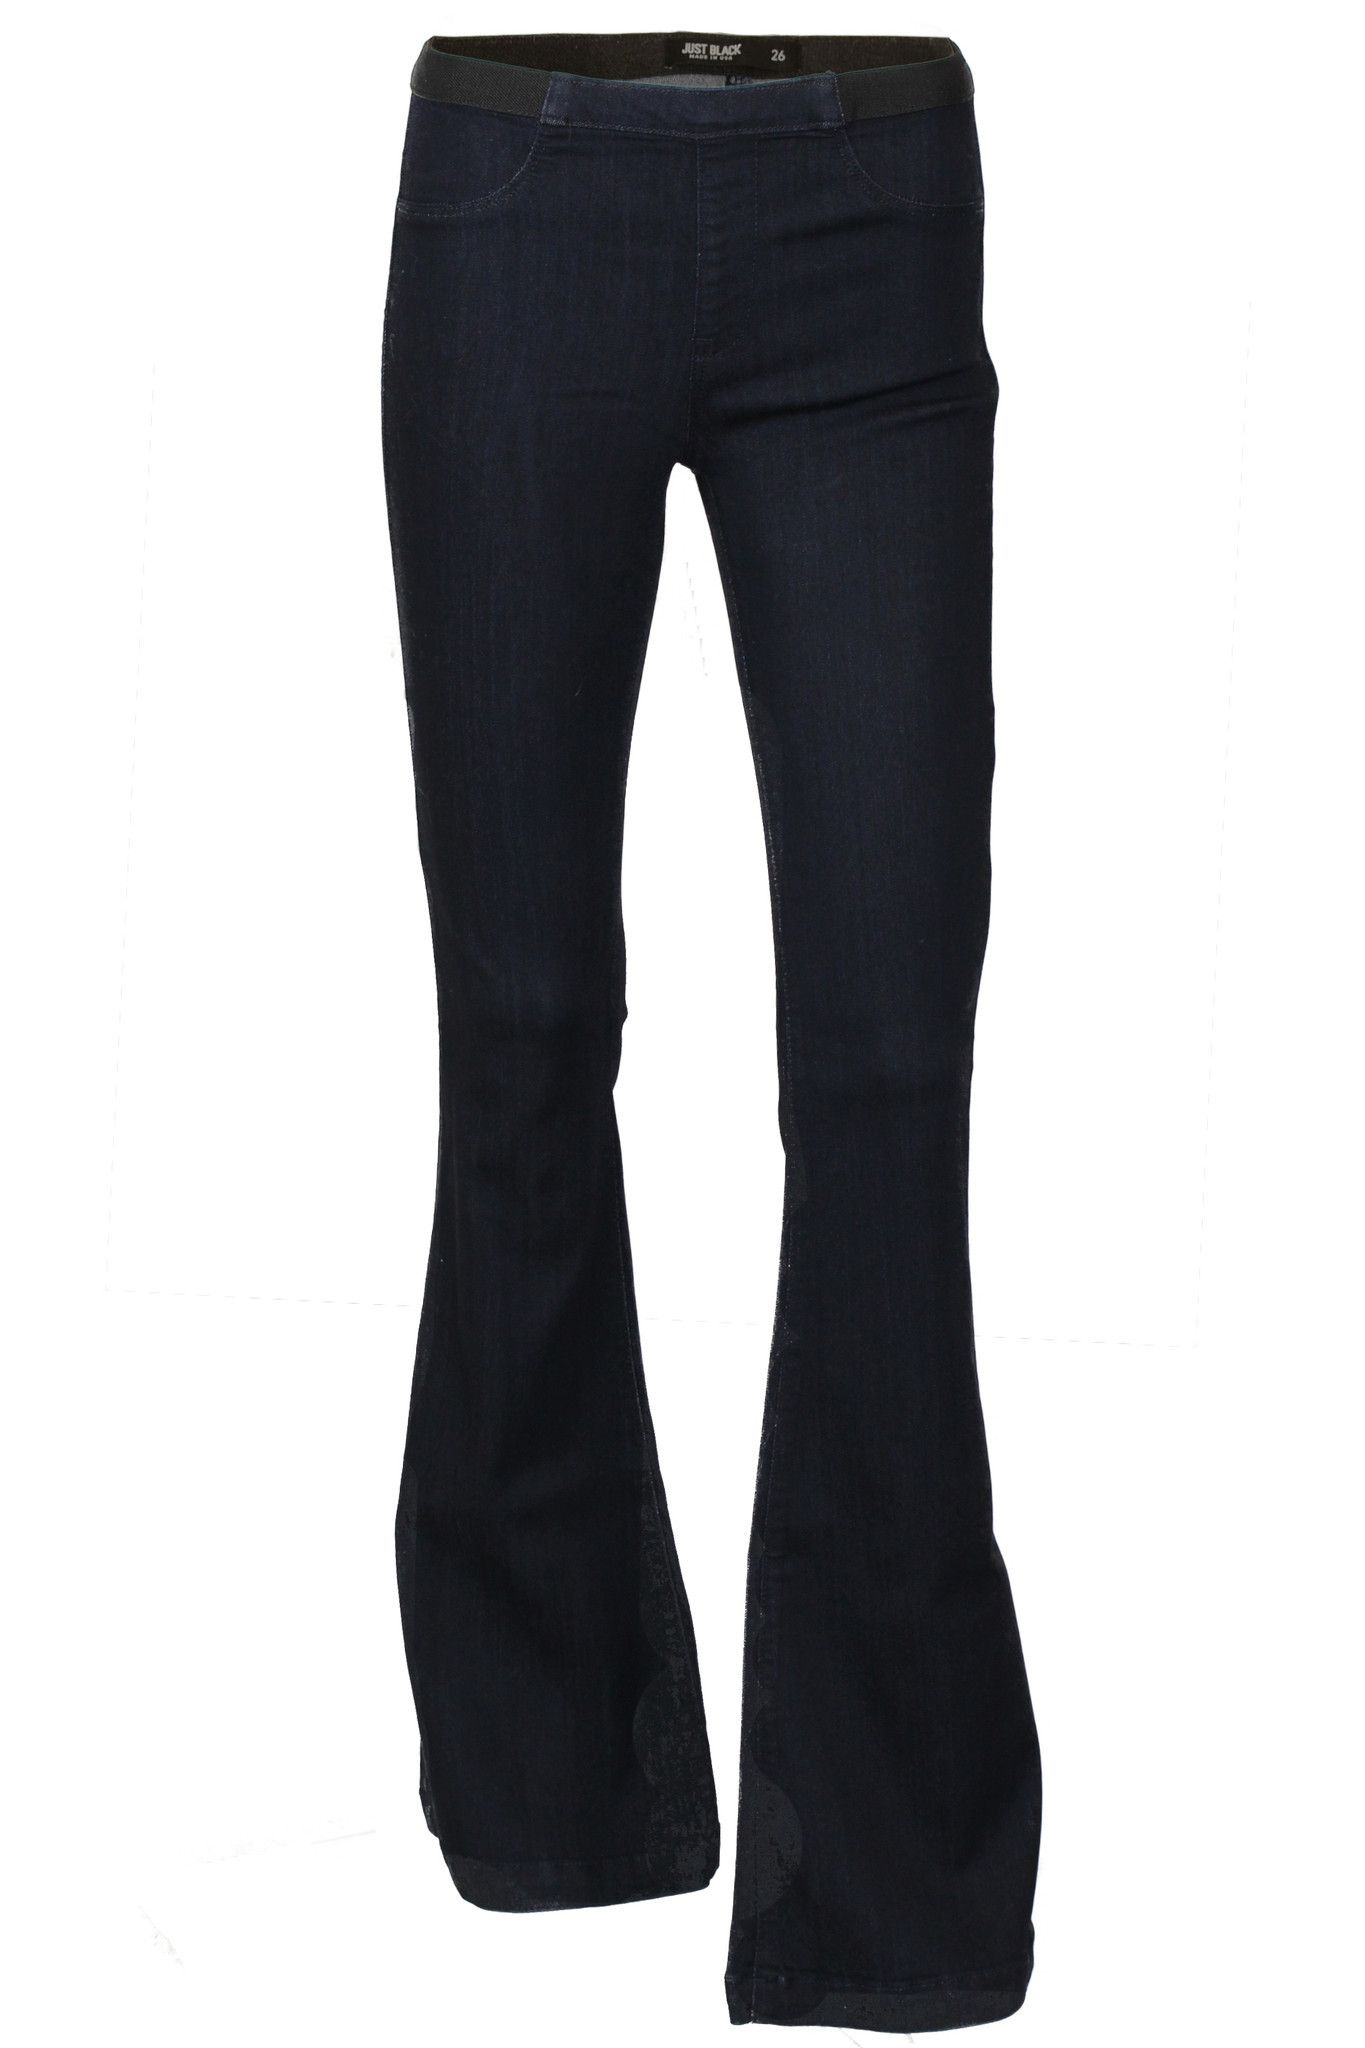 0752976ea4c2f3 High Rise Elastic Waist Stretch Flare Jeans - Super Dark Wash | Love ...